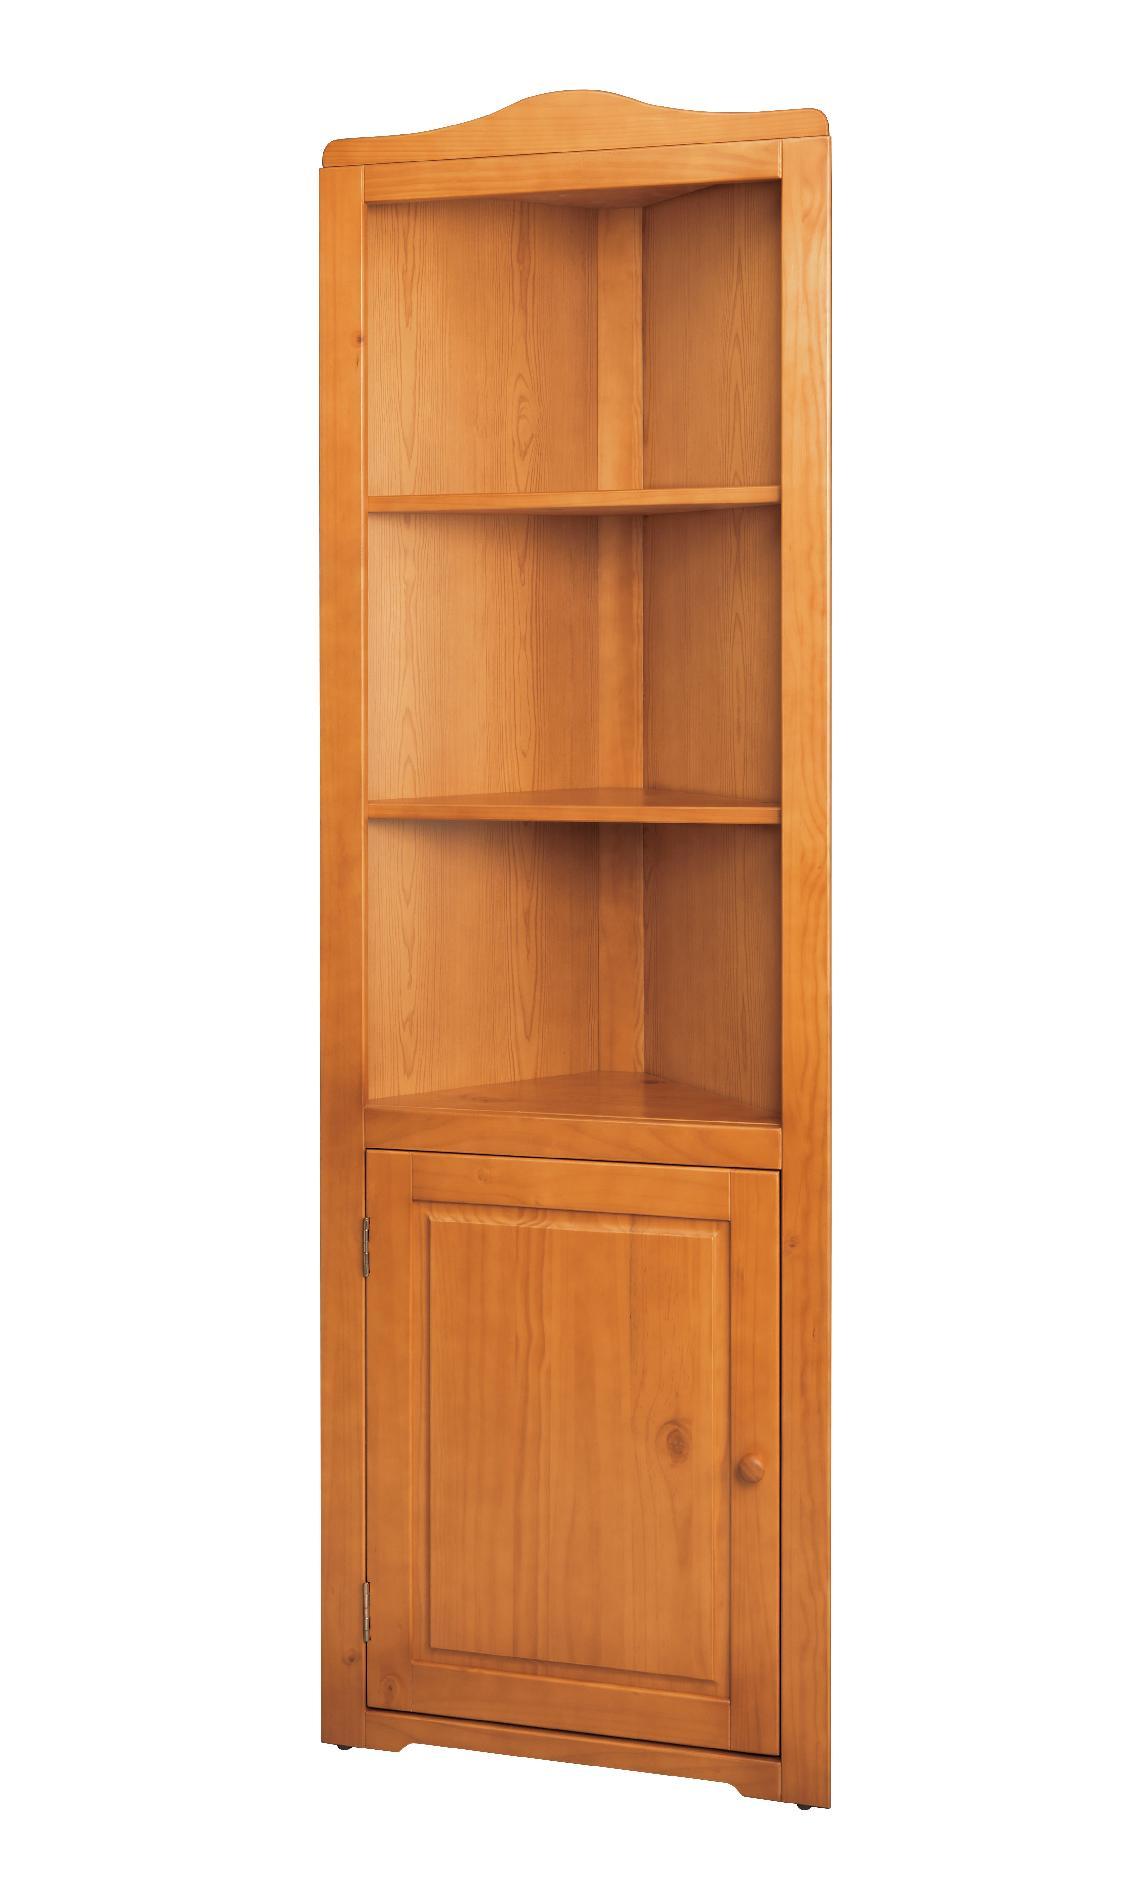 Essential Home Emily Corner Cabinet